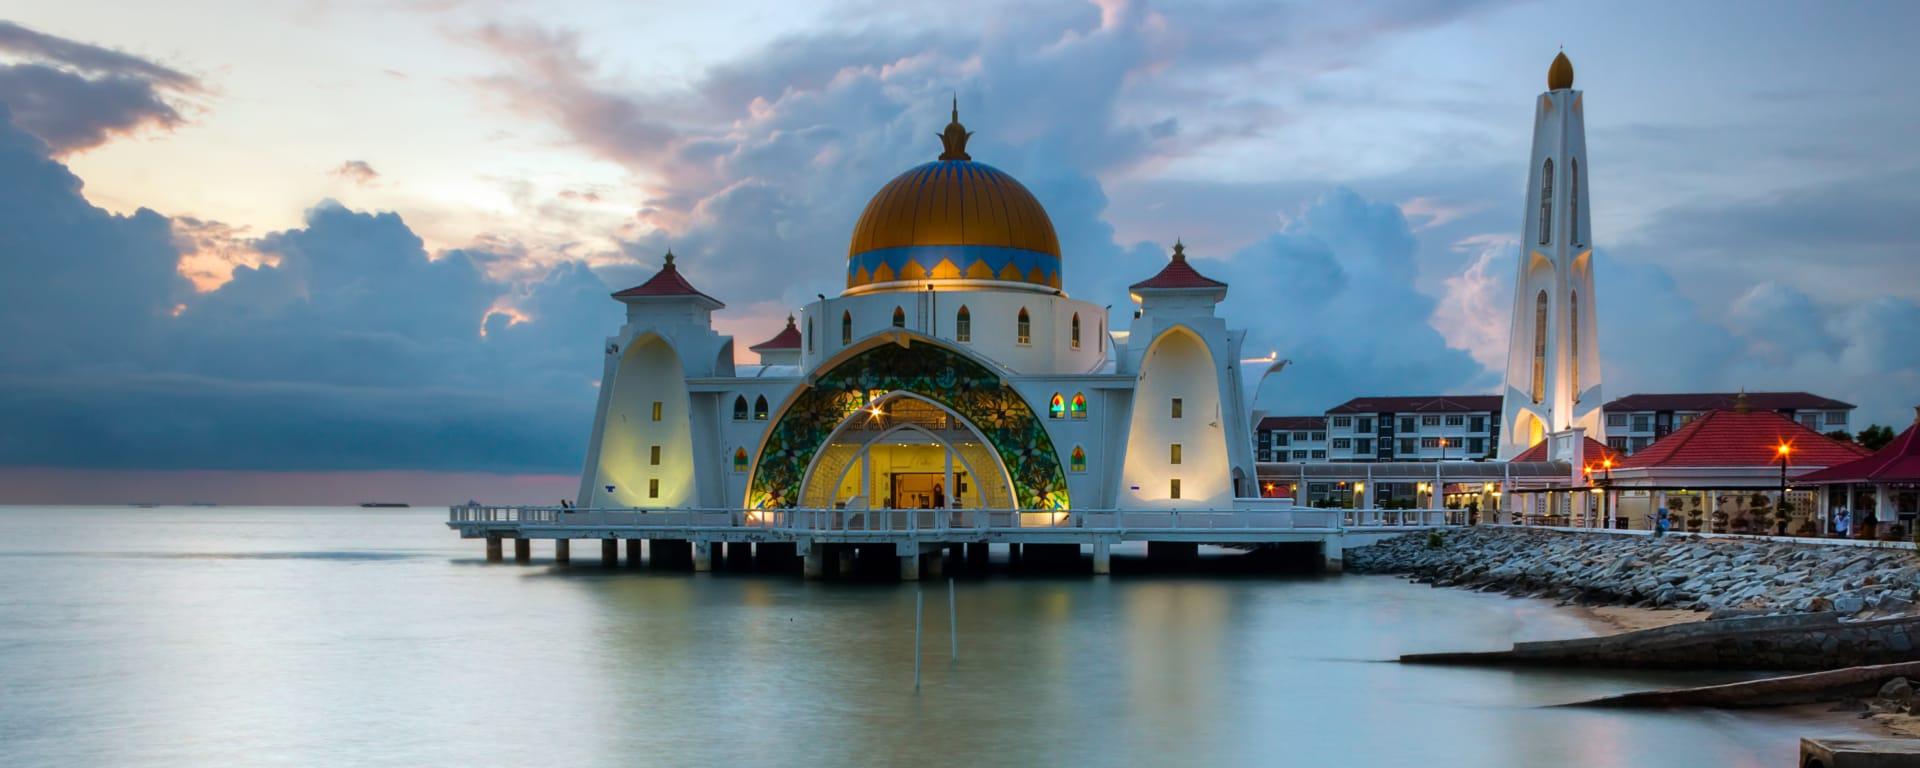 Malaysia entdecken mit Tischler Reisen: Malaysia Malakka Moschee